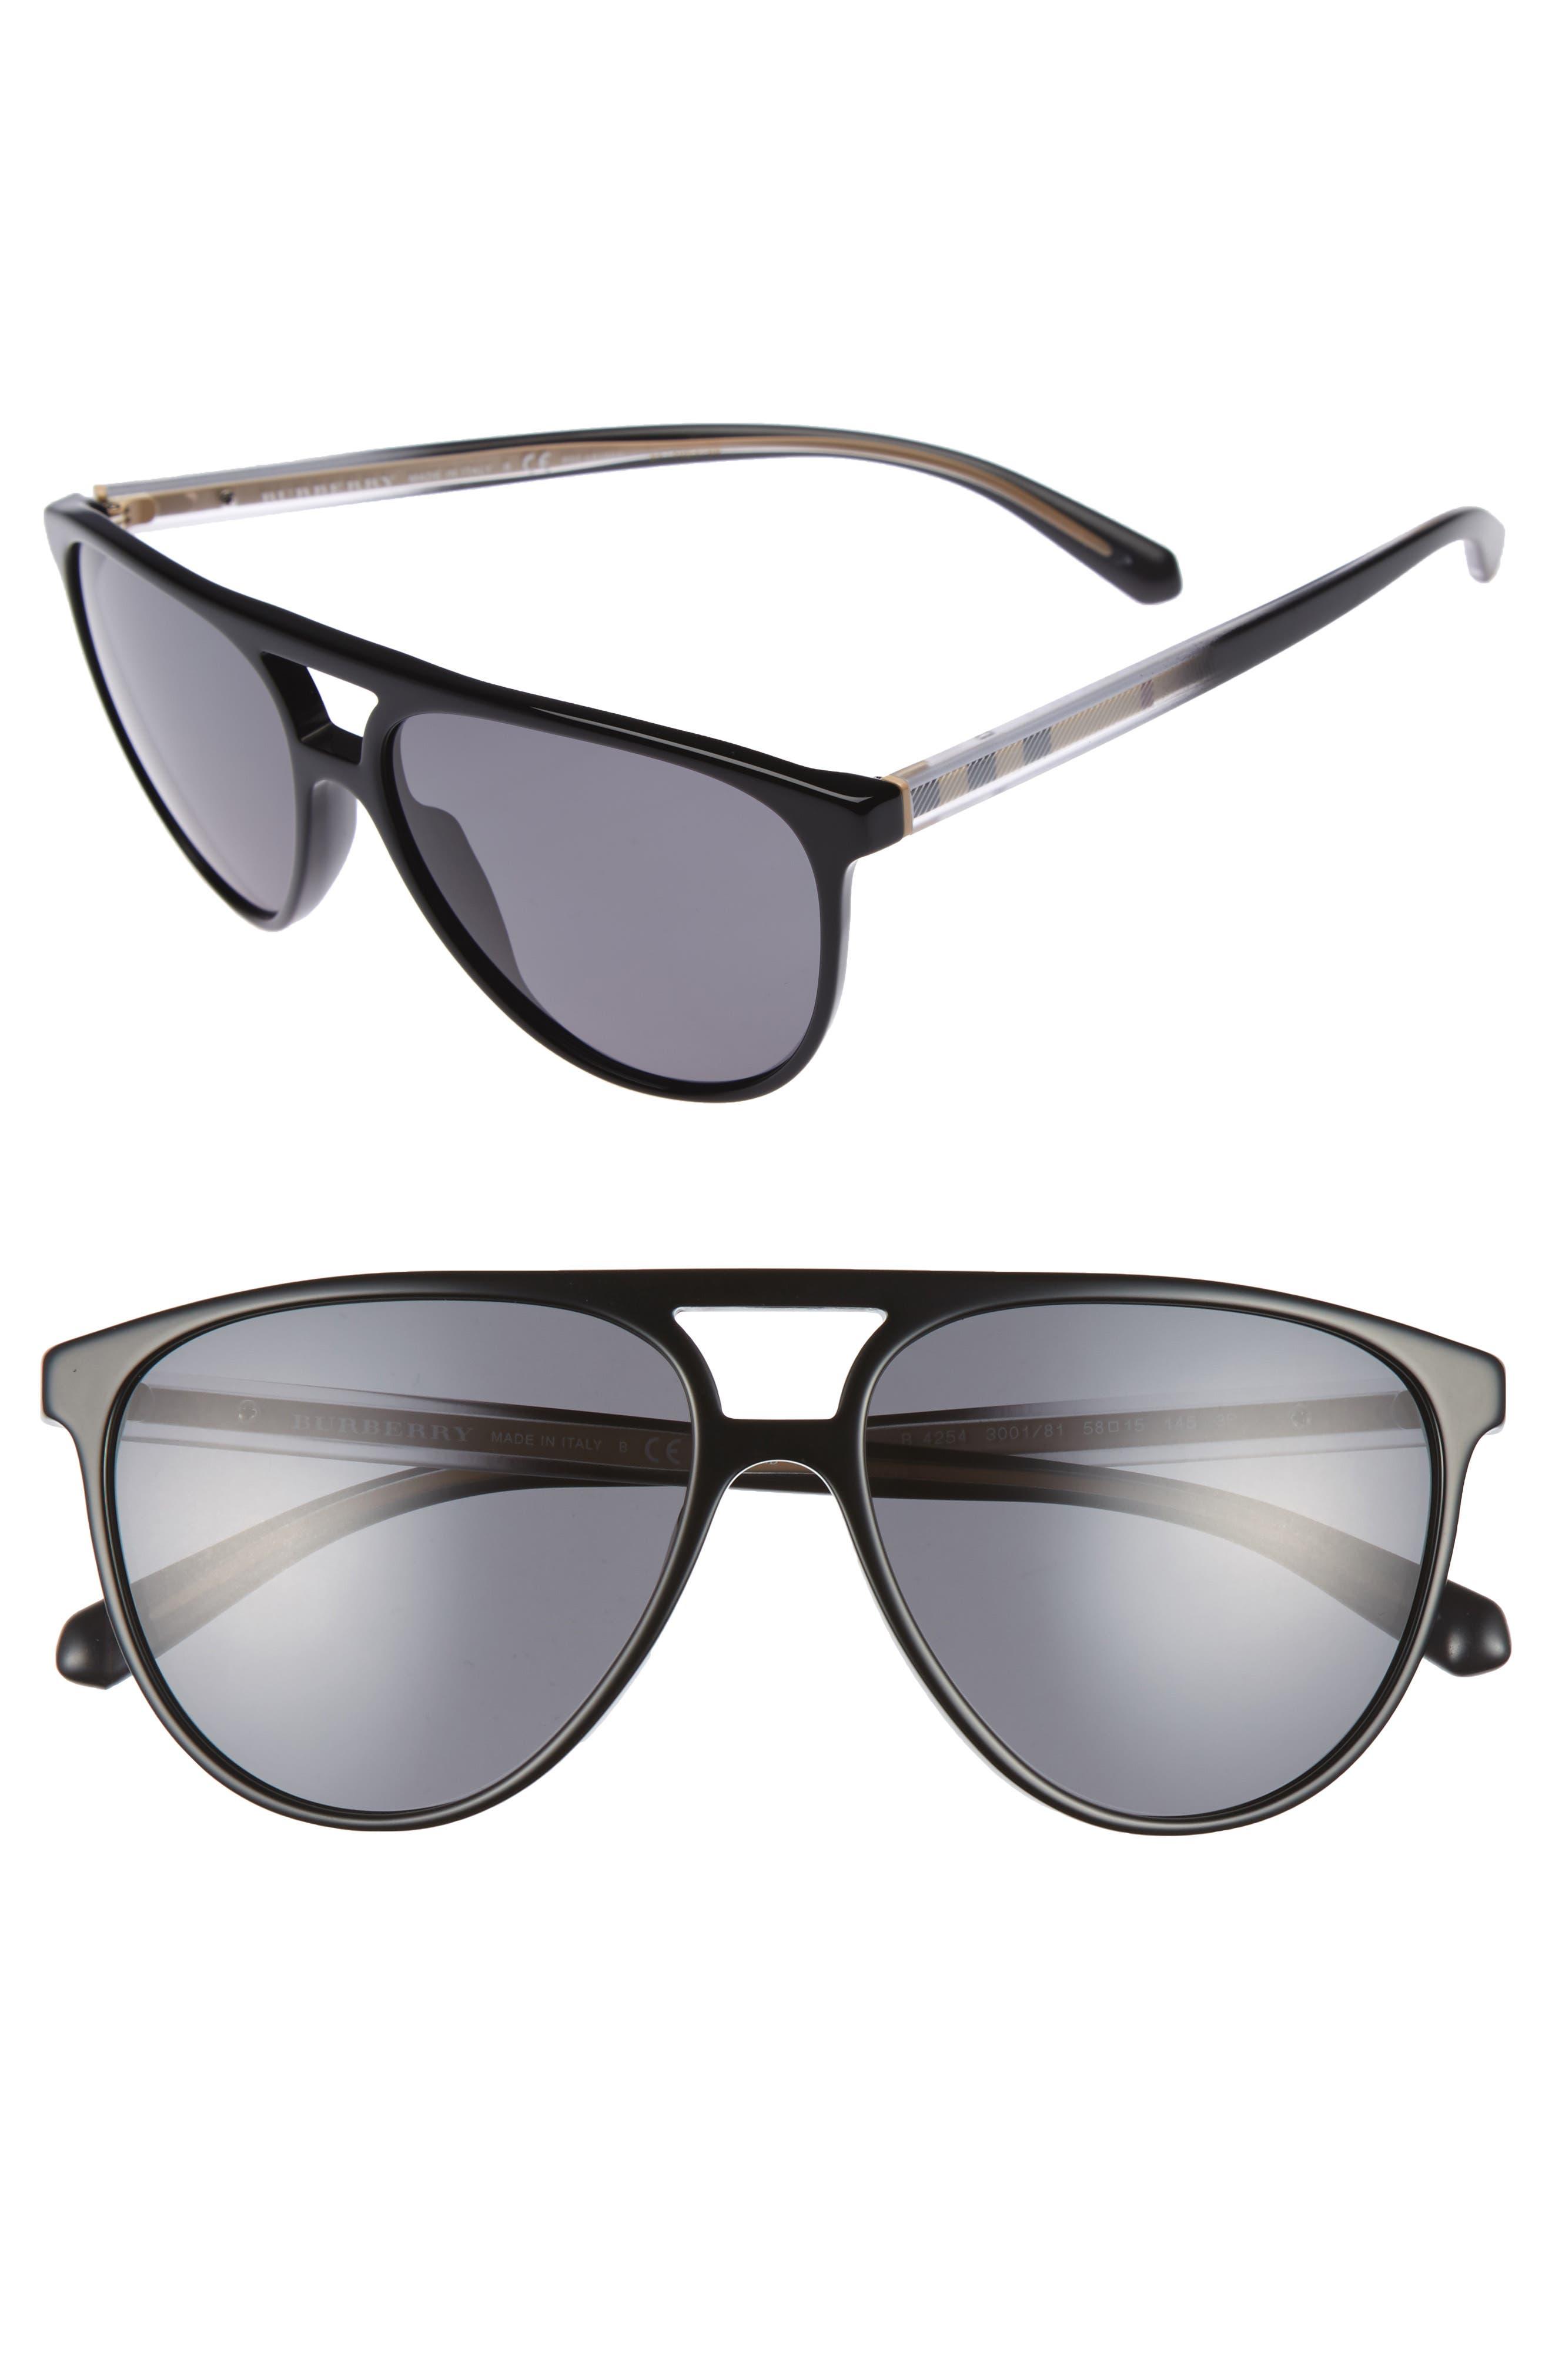 58mm Polarized Aviator Sunglasses,                             Main thumbnail 1, color,                             001